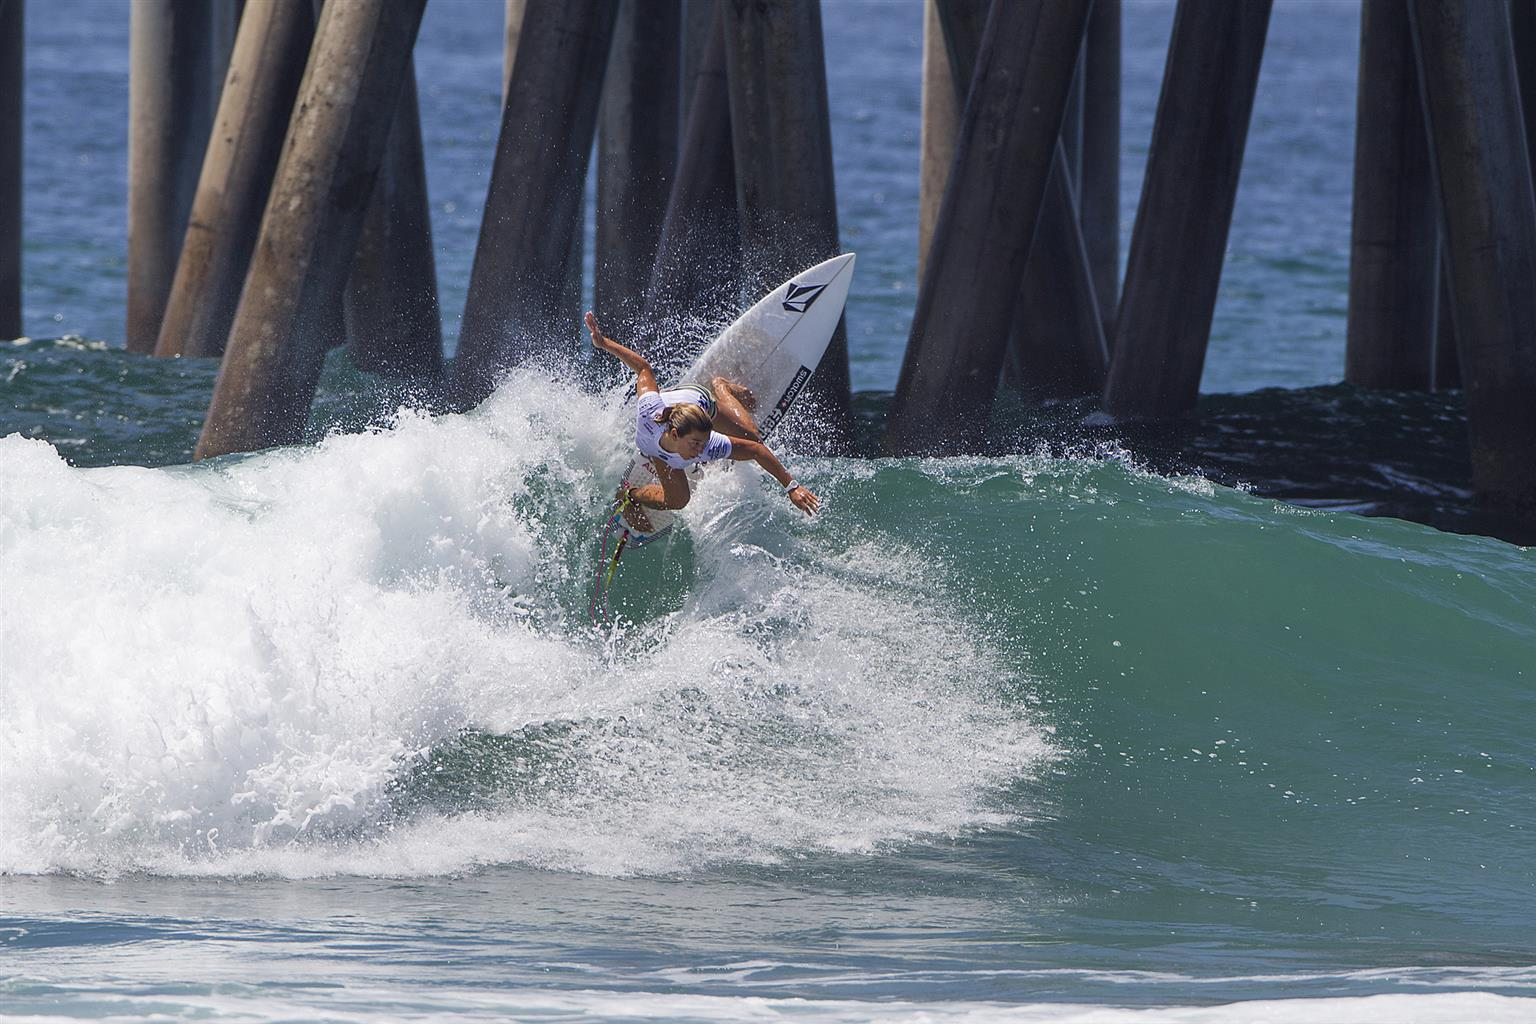 Niecodzienna sesja surferki